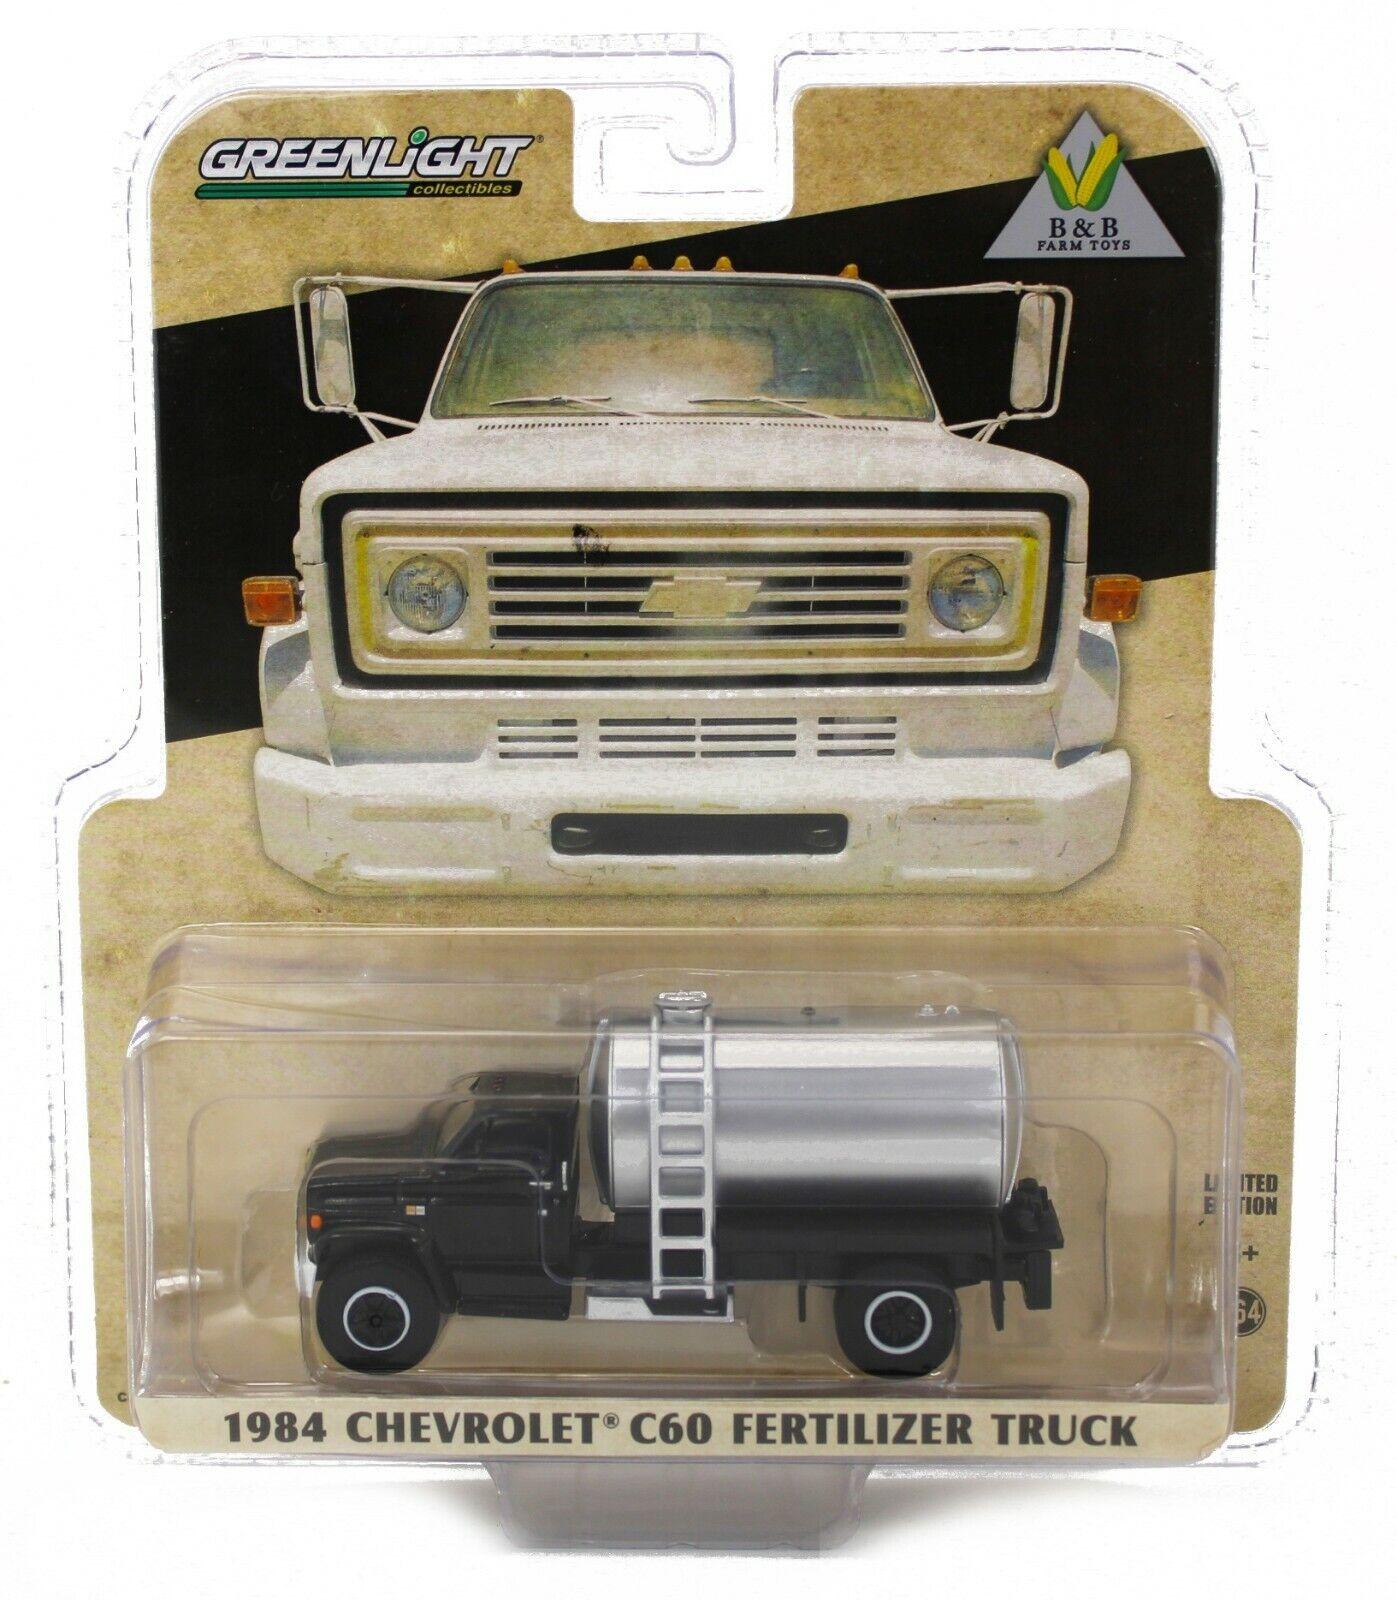 NEW! 1:64 Greenlight 1984 Chevrolet C60 *FERTILIZER TRUCK* BLACK *NIP*